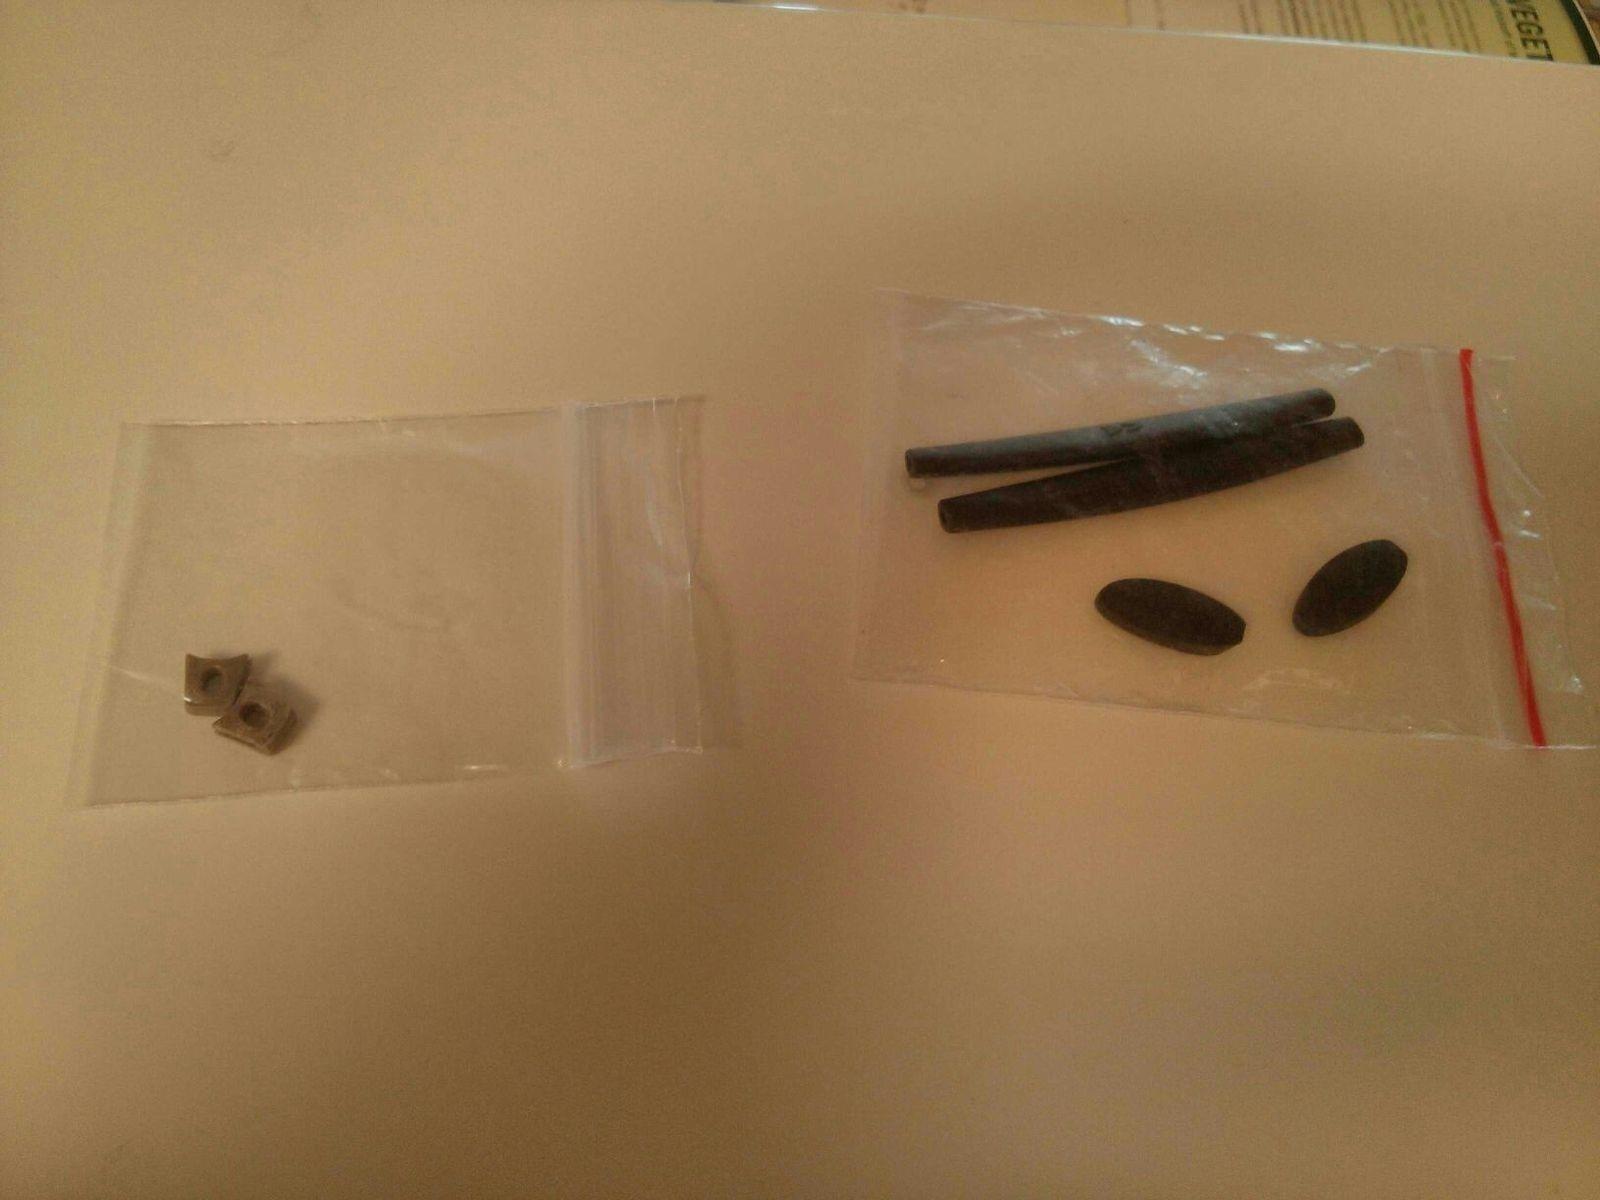 XS Nosebridge Gasket And Black Rubbers - a2a4ema5.jpg